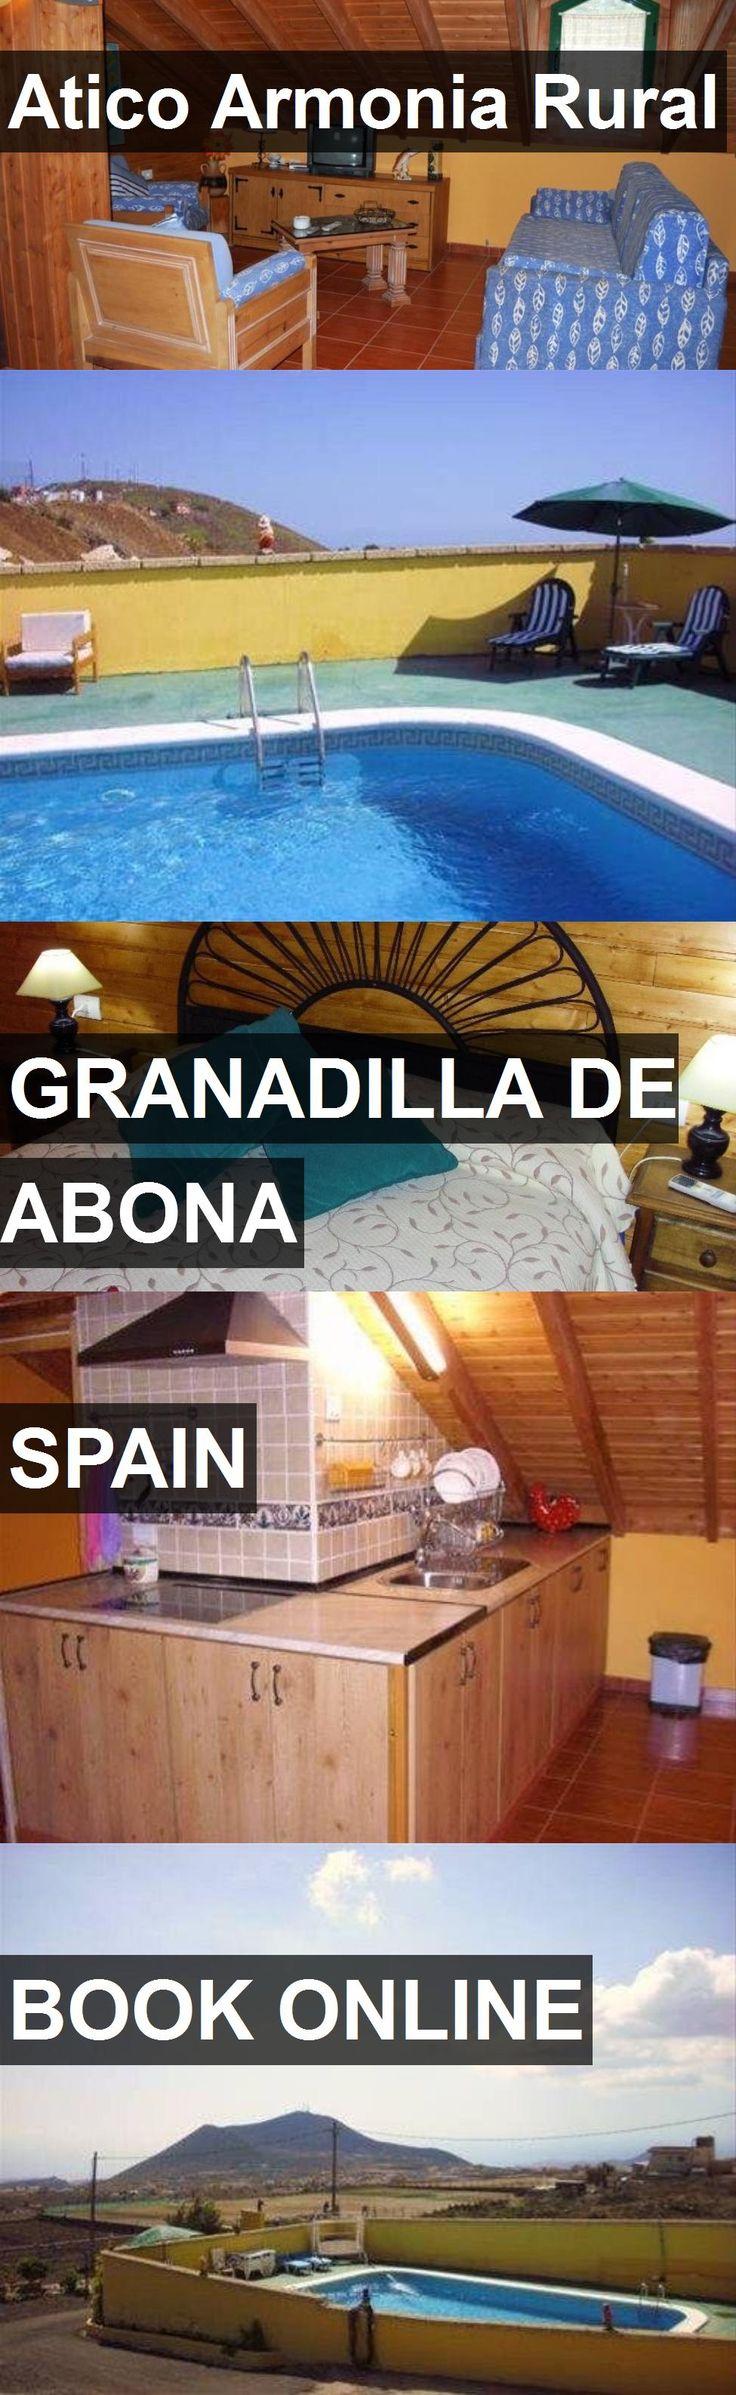 Hotel Atico Armonia Rural in Granadilla de Abona, Spain. For more information, photos, reviews and best prices please follow the link. #Spain #GranadilladeAbona #travel #vacation #hotel